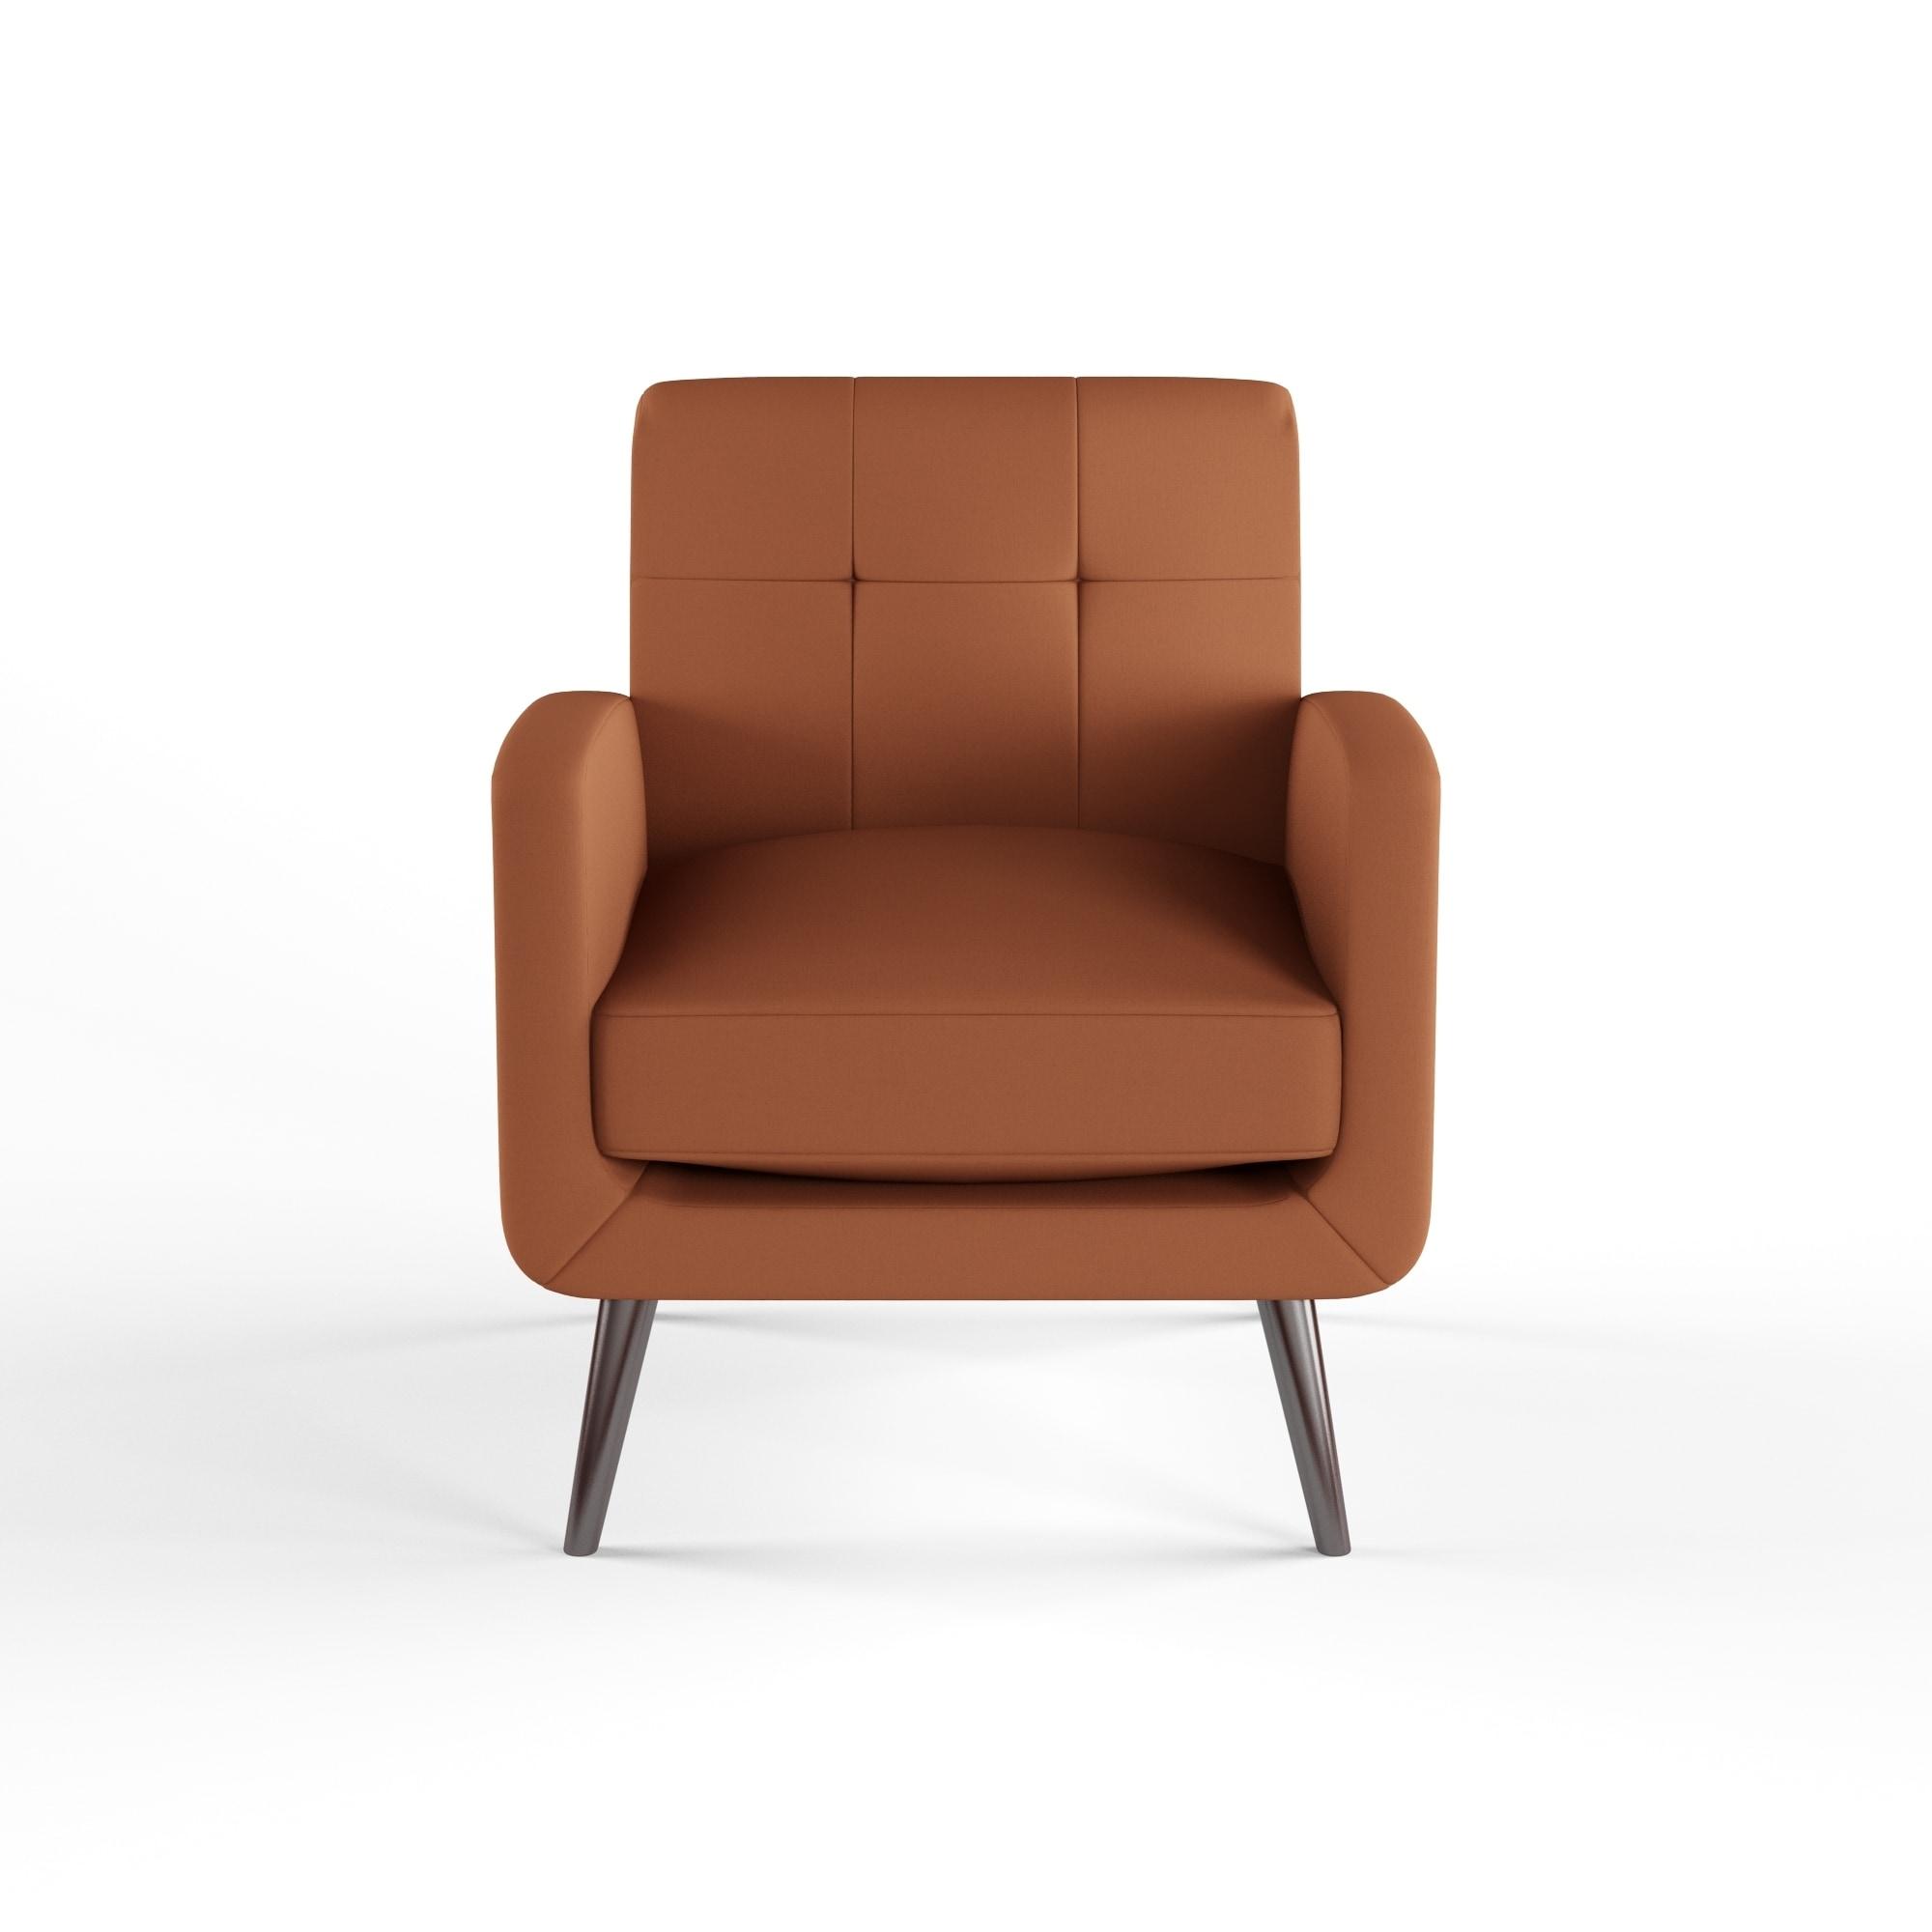 Etonnant Shop Carson Carrington Keflavik Mid Century Orange Linen Arm Chair   On  Sale   Free Shipping Today   Overstock.com   19529733